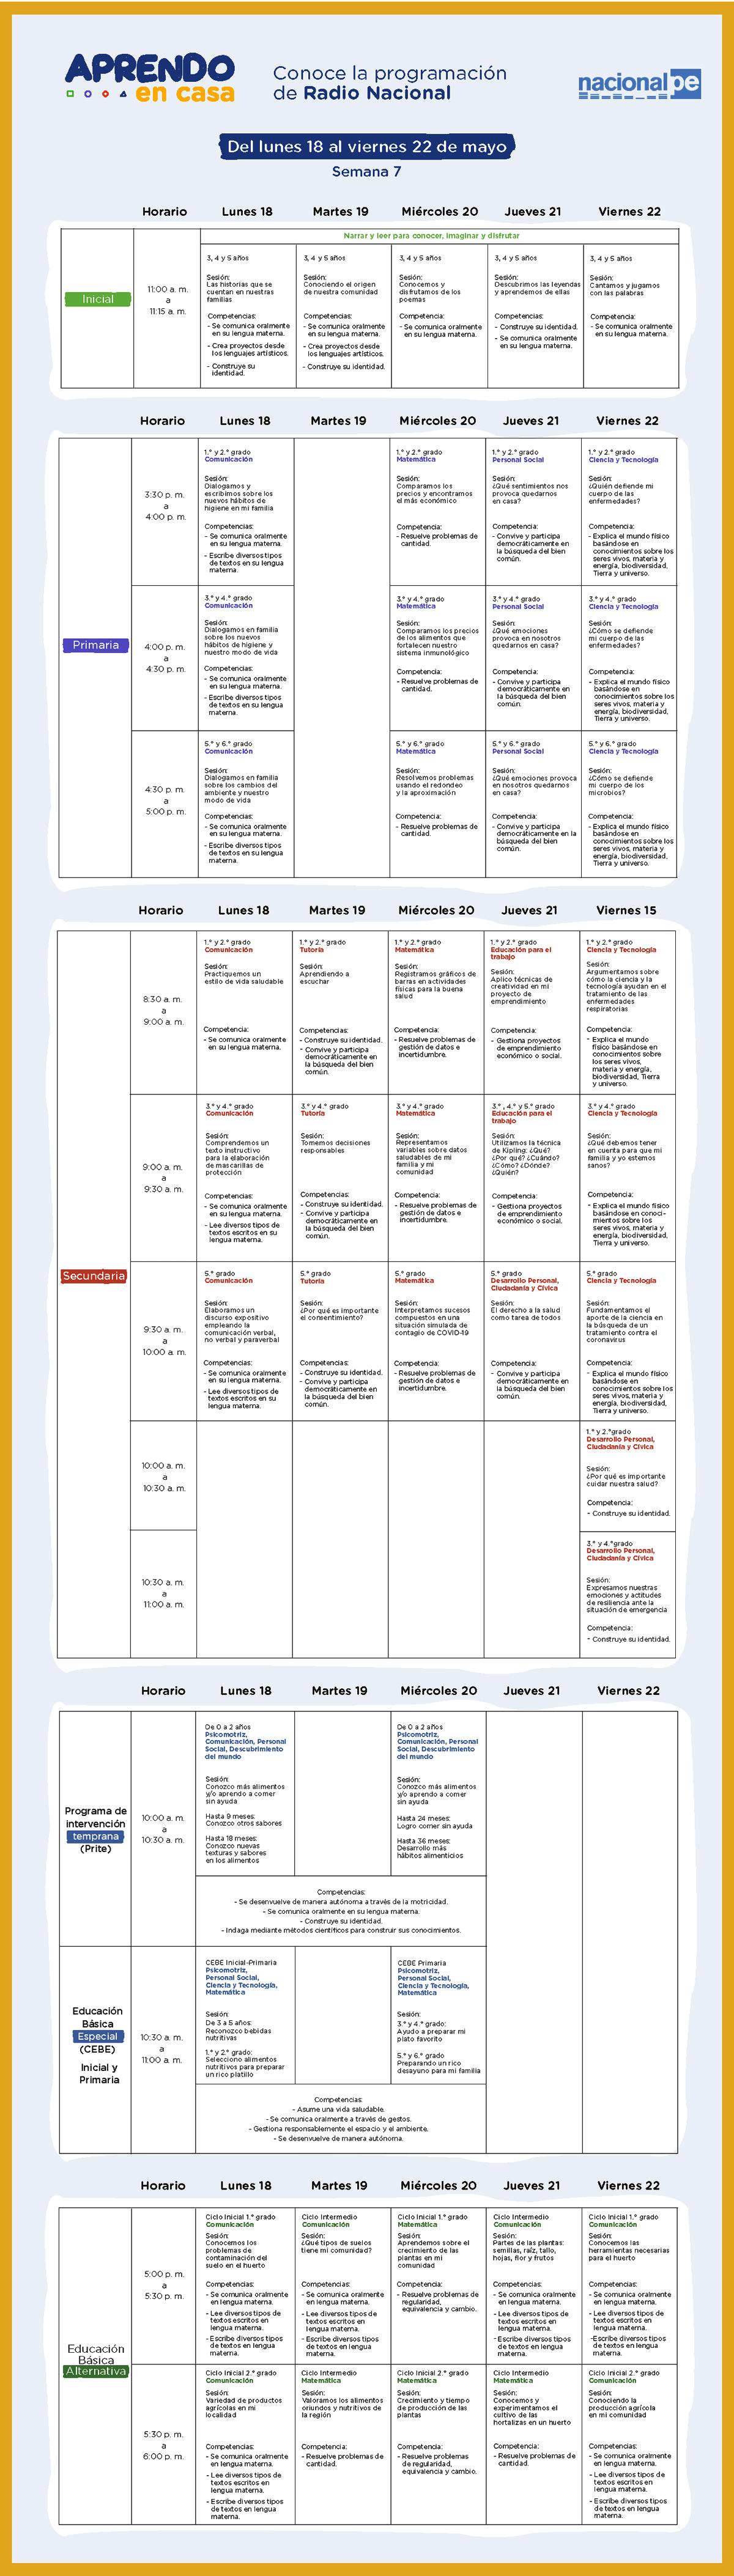 Calendario Semana 7 Aprendoencasa por Radio Nacional